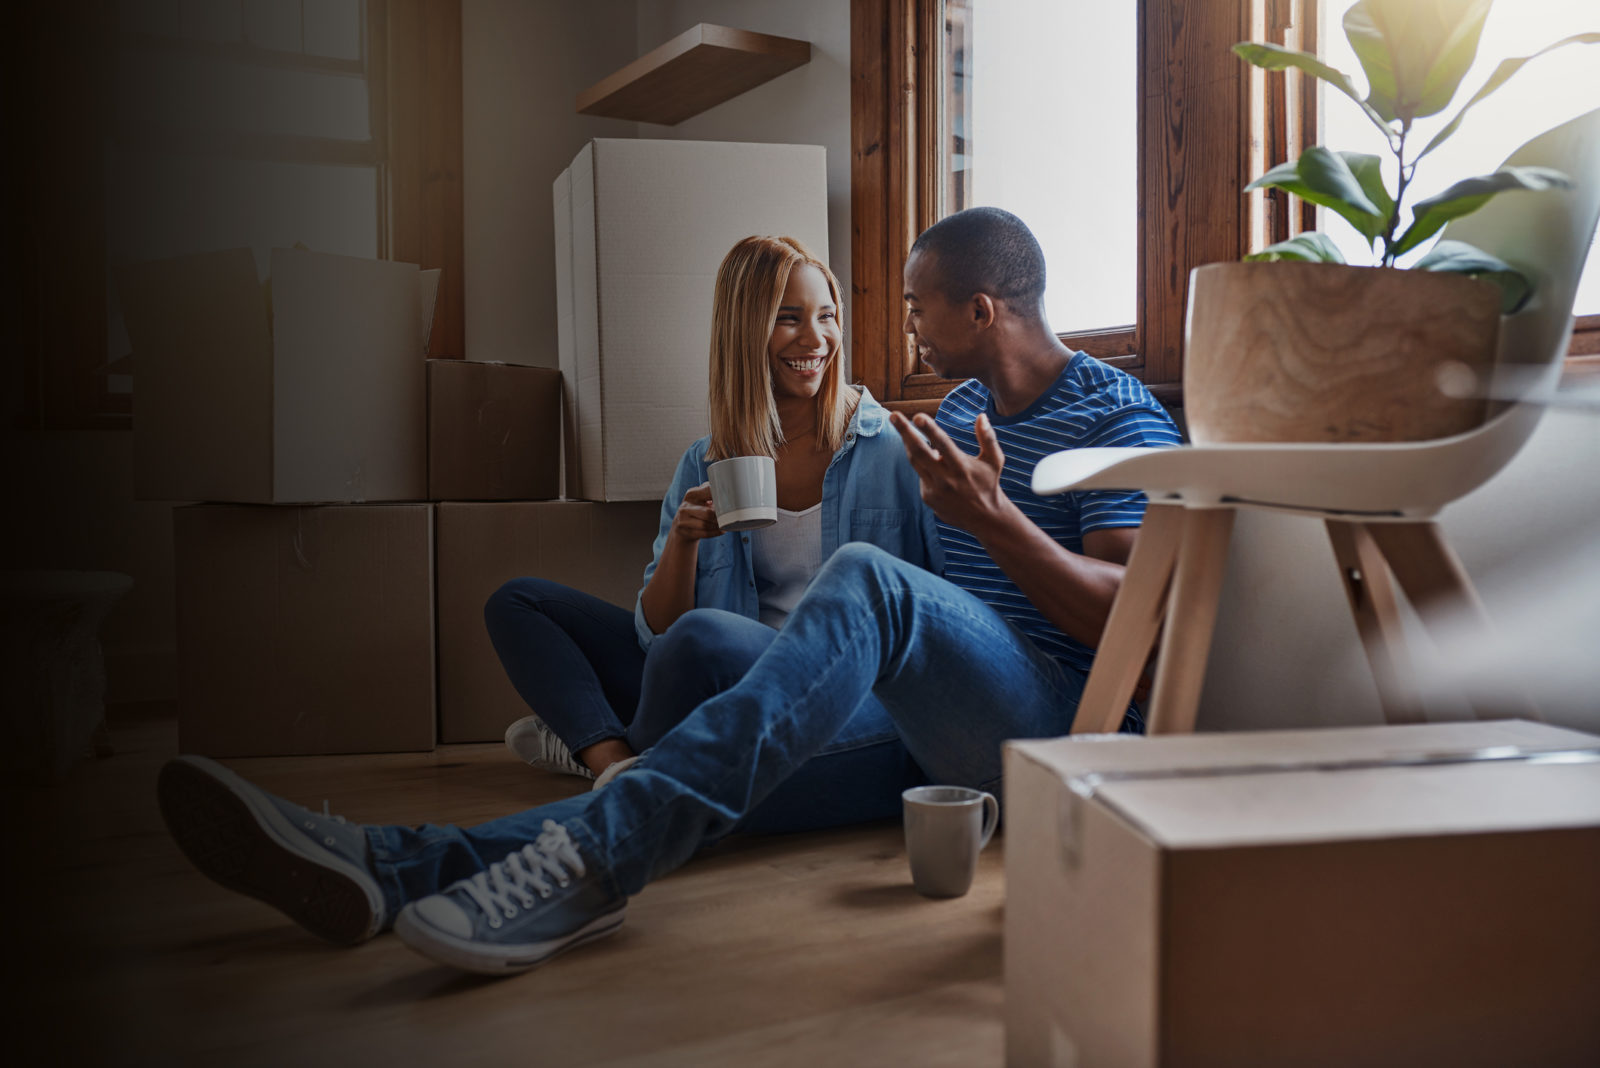 Couple enjoying their new home